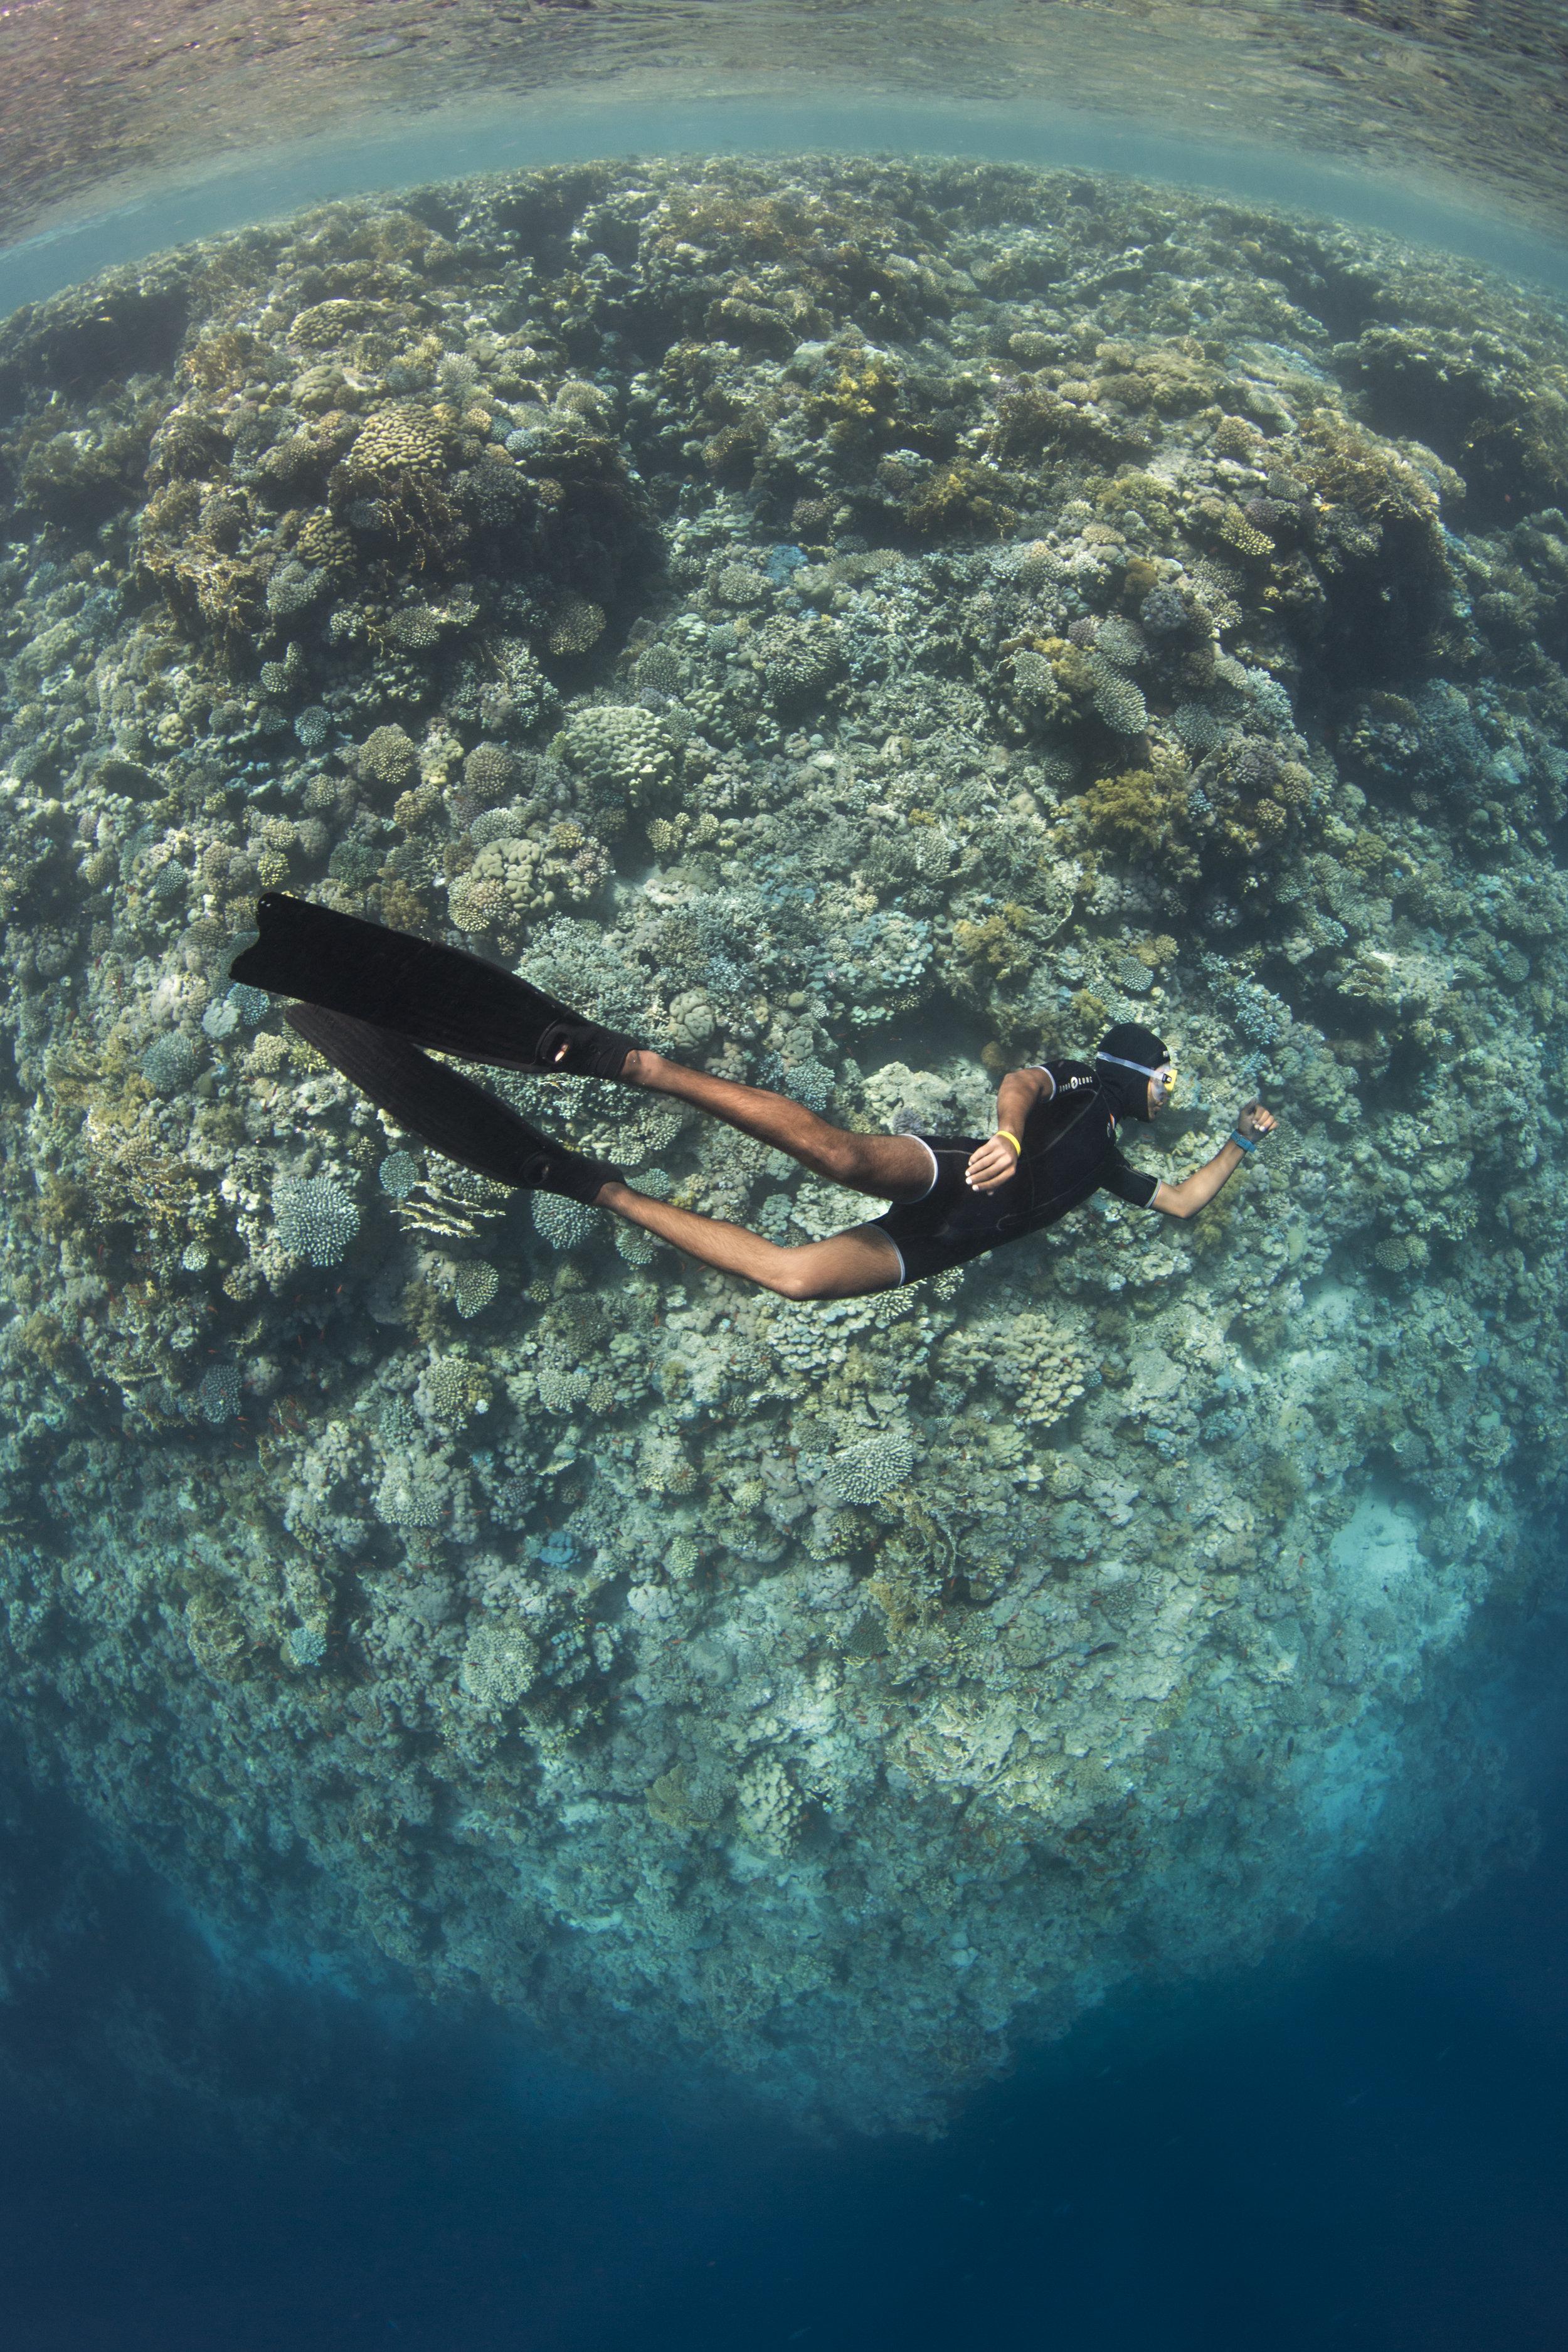 freeDIVER CREDIT: RENATA ROMEO / coral reef image bank